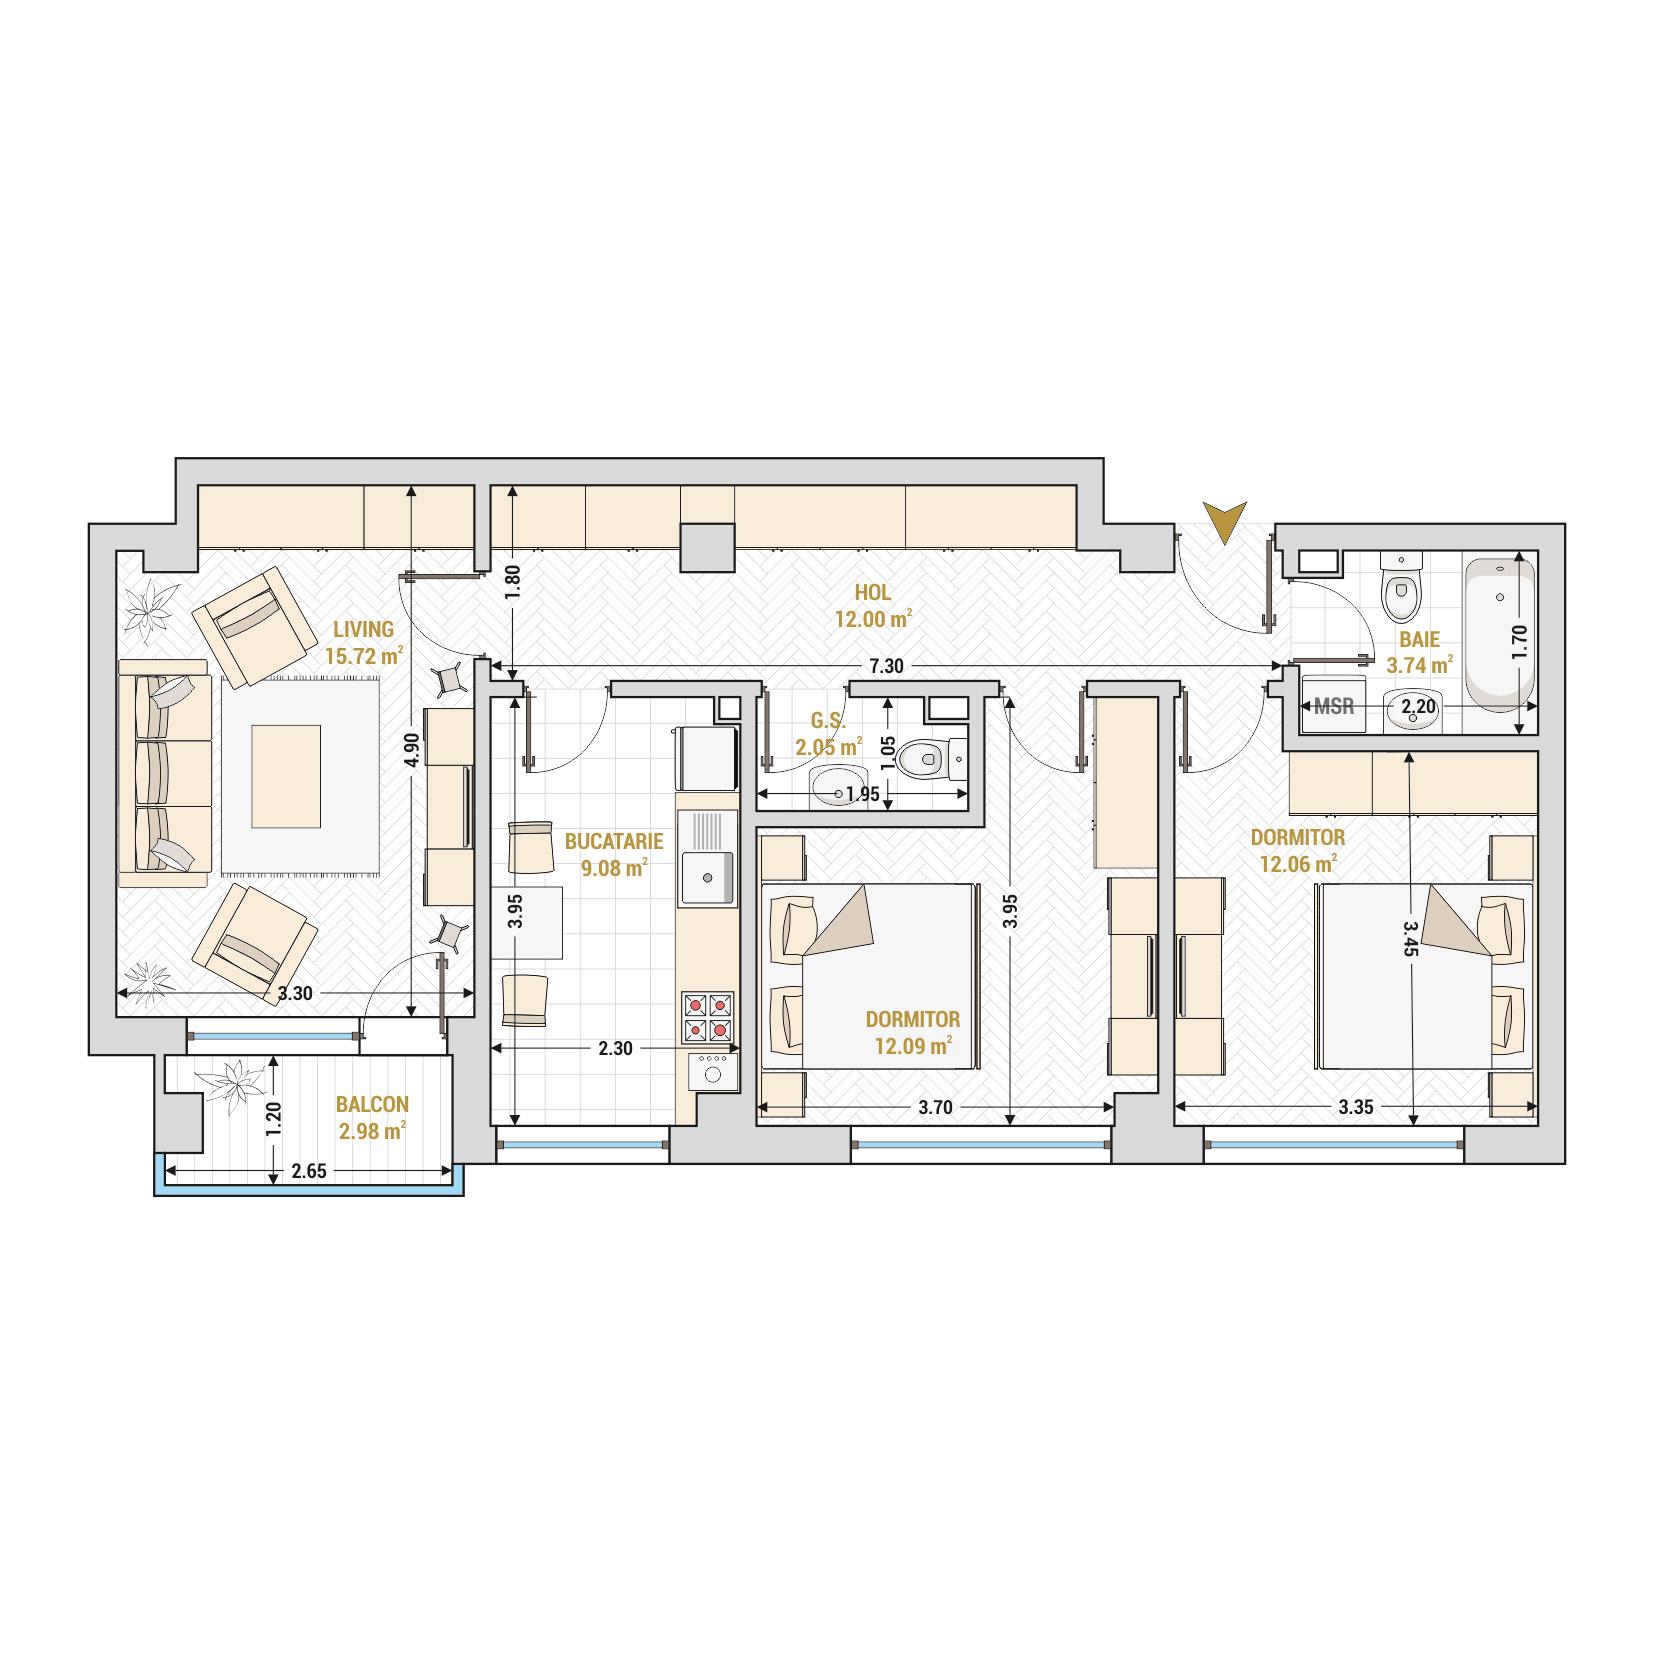 Apartament 3 camere de vanzare Bucuresti - Catedral Residence - Marriott, Piata Unirii, 13 Septembrie, Izvor - Tip 2 - T2